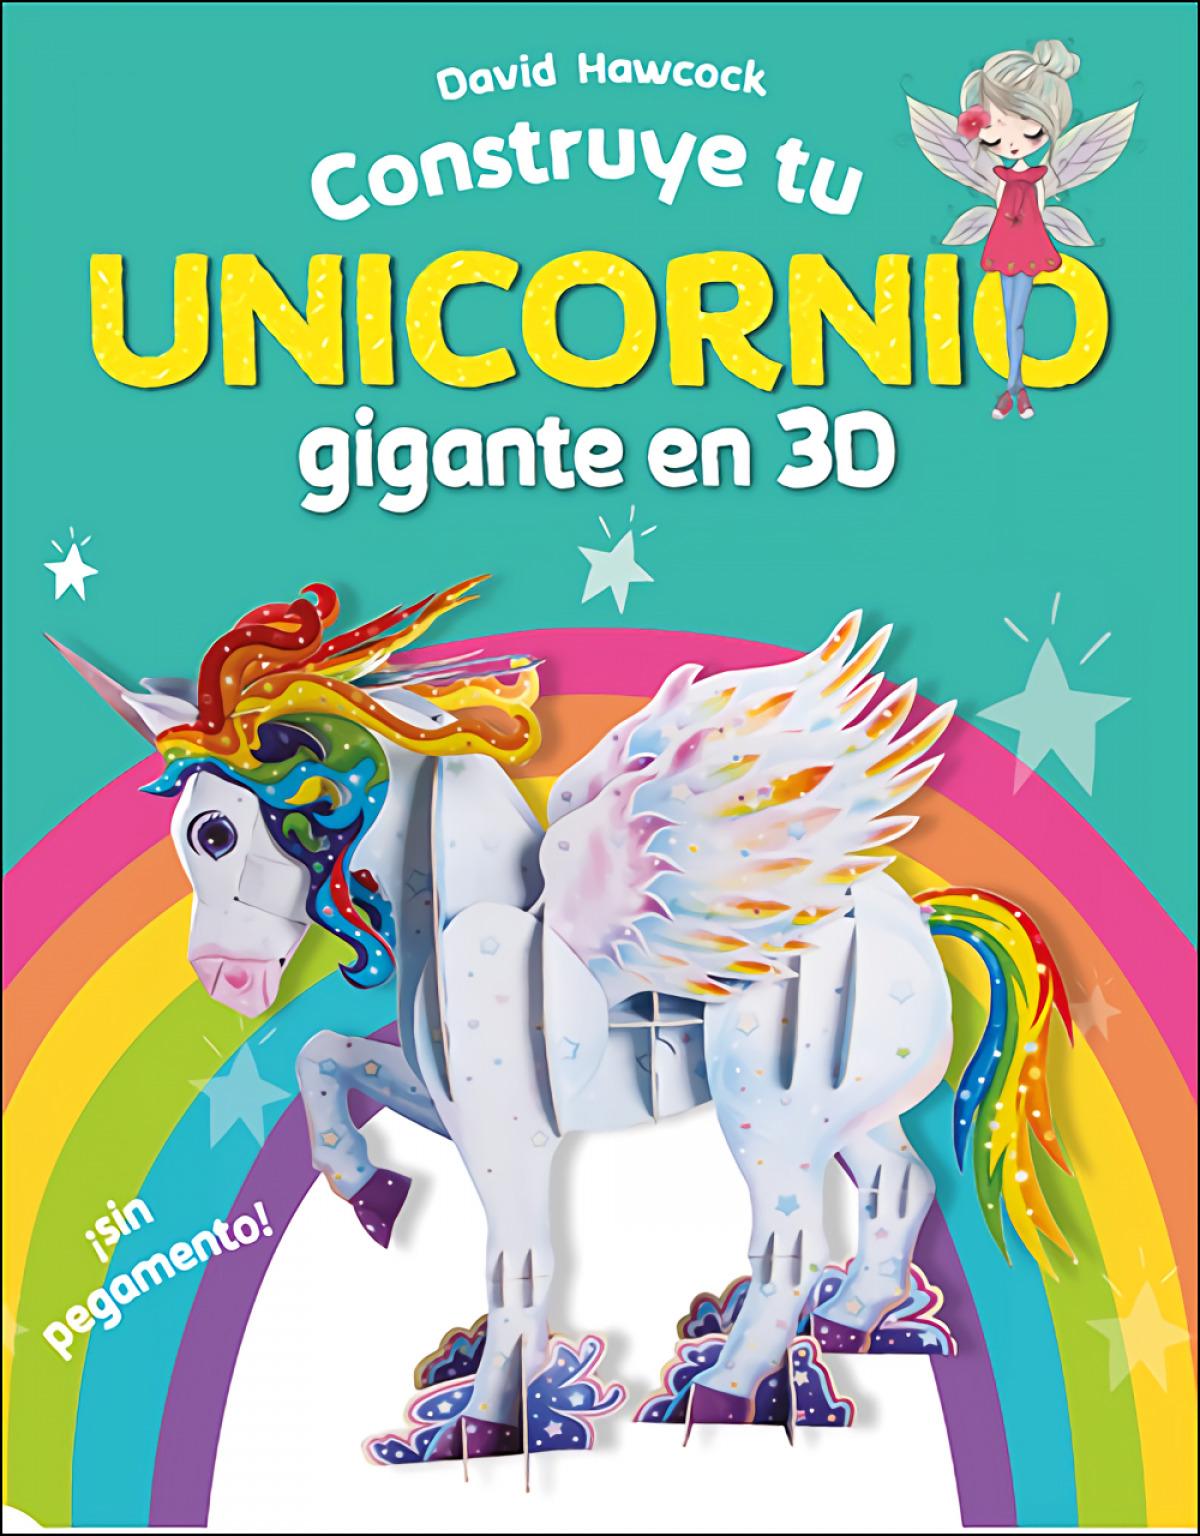 Construye tu unicornio gigante en 3D